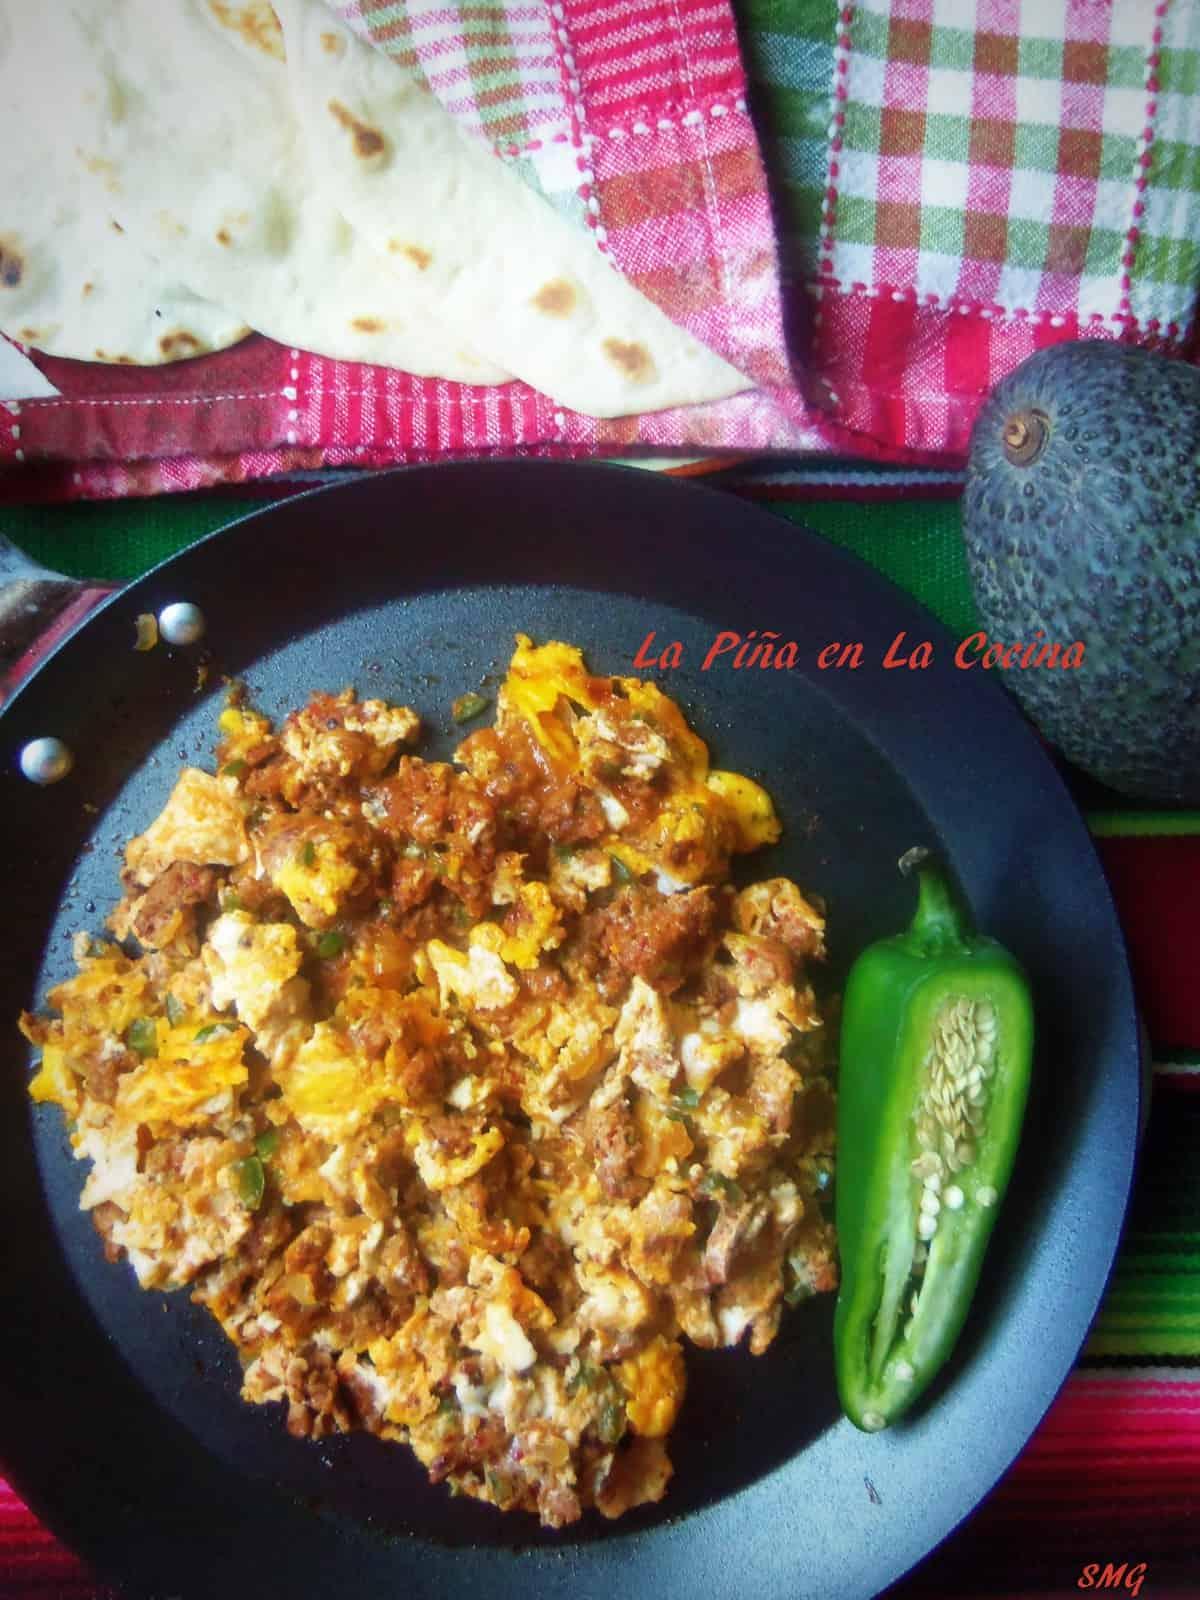 Don't forget to prepare a few homemade flour tortillas for your homemade chorizo con huevo